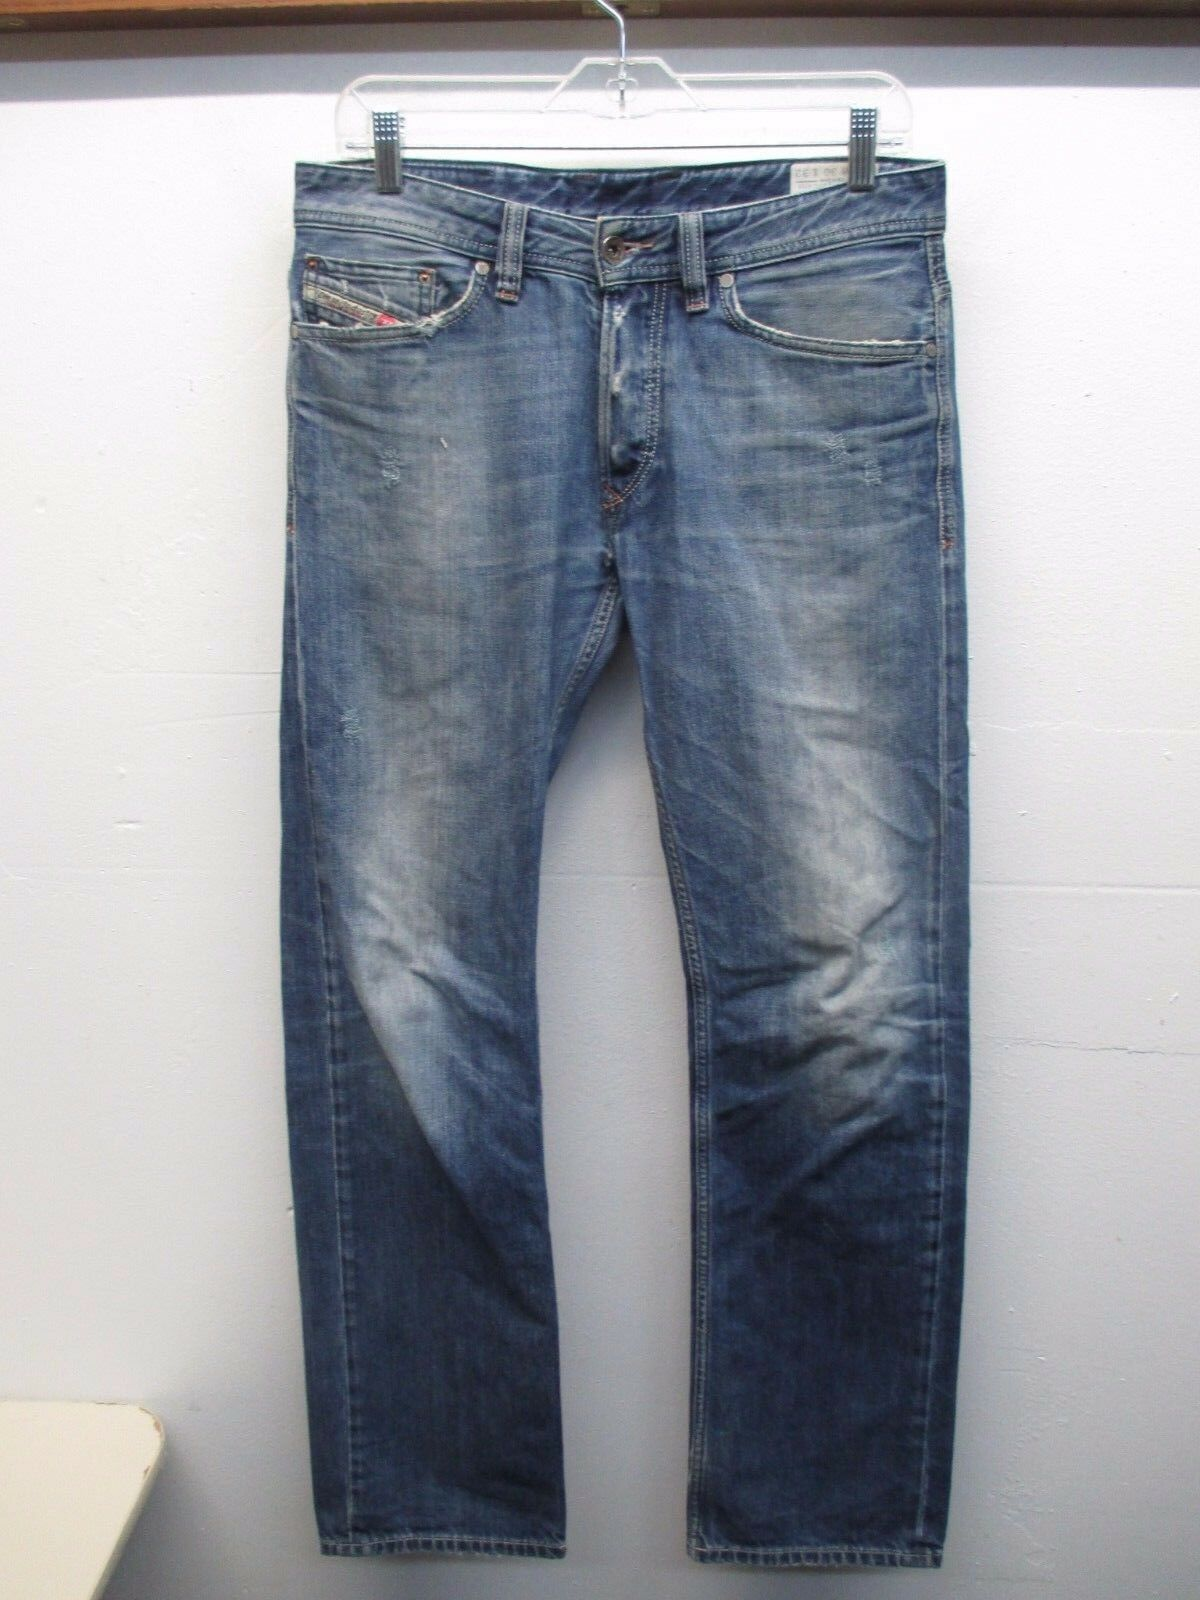 Diesel Viker Men's Button Fly Distressed Regular Straight bluee Jeans 30Wx32L